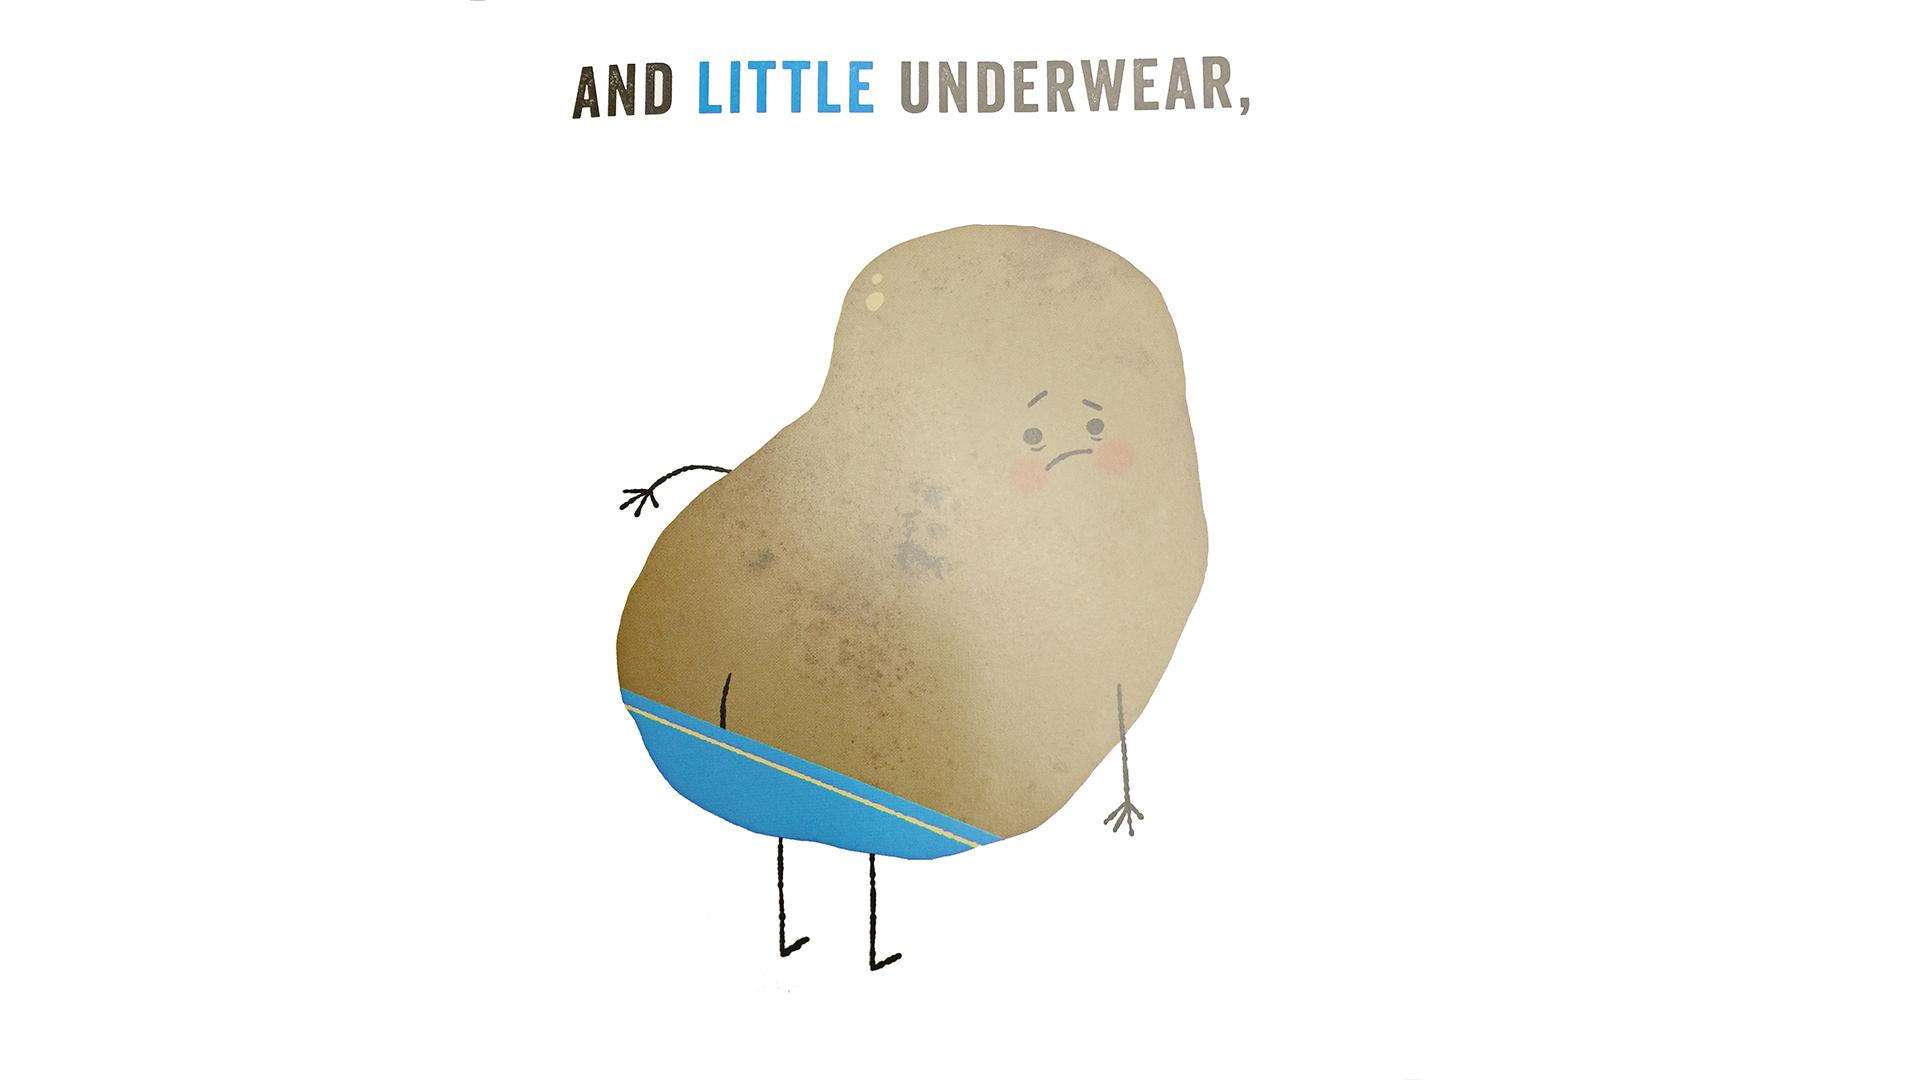 Vegetables in Underwear - Our favorite books in 2017